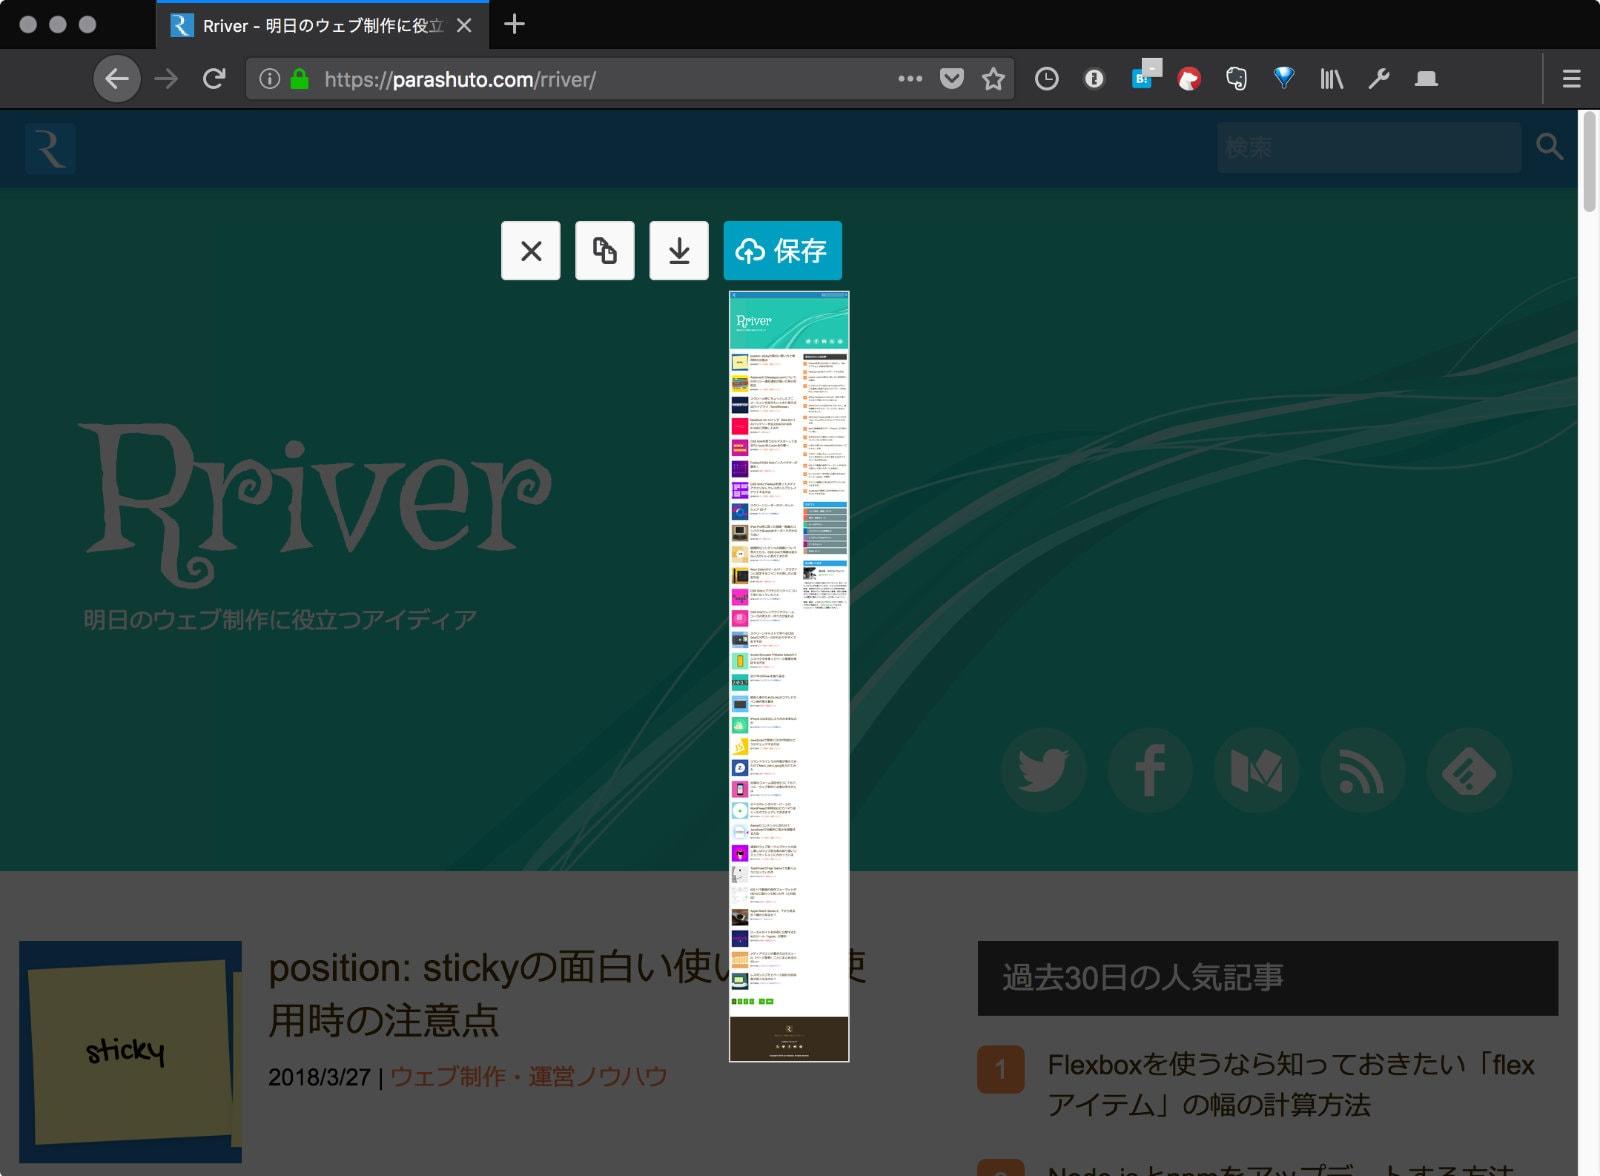 Firefox Screenshotsのページ全体のスクショを撮る画面